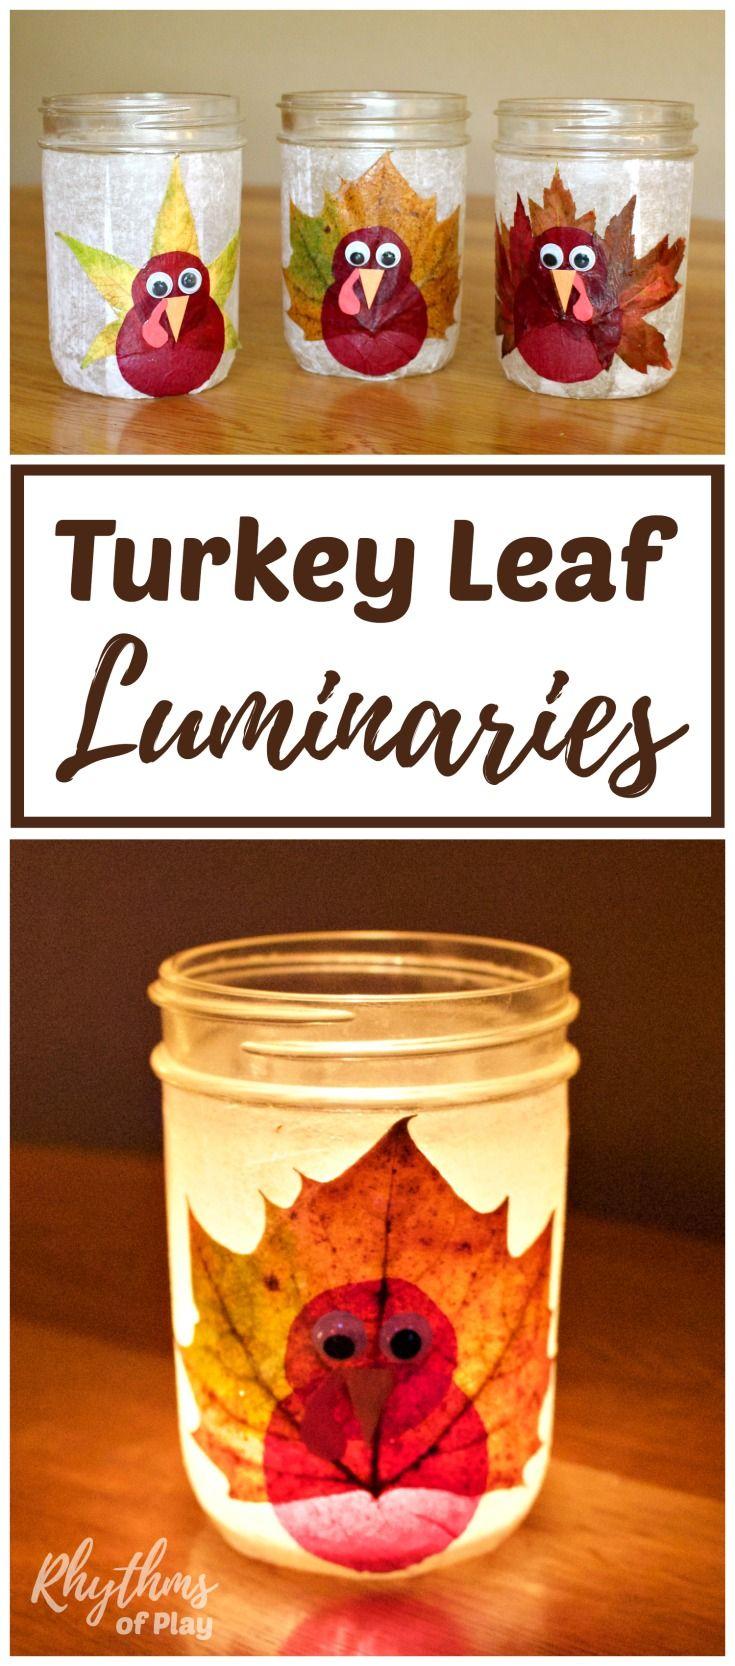 Turkey leaf lanterns thanksgiving craft autumn nature nature